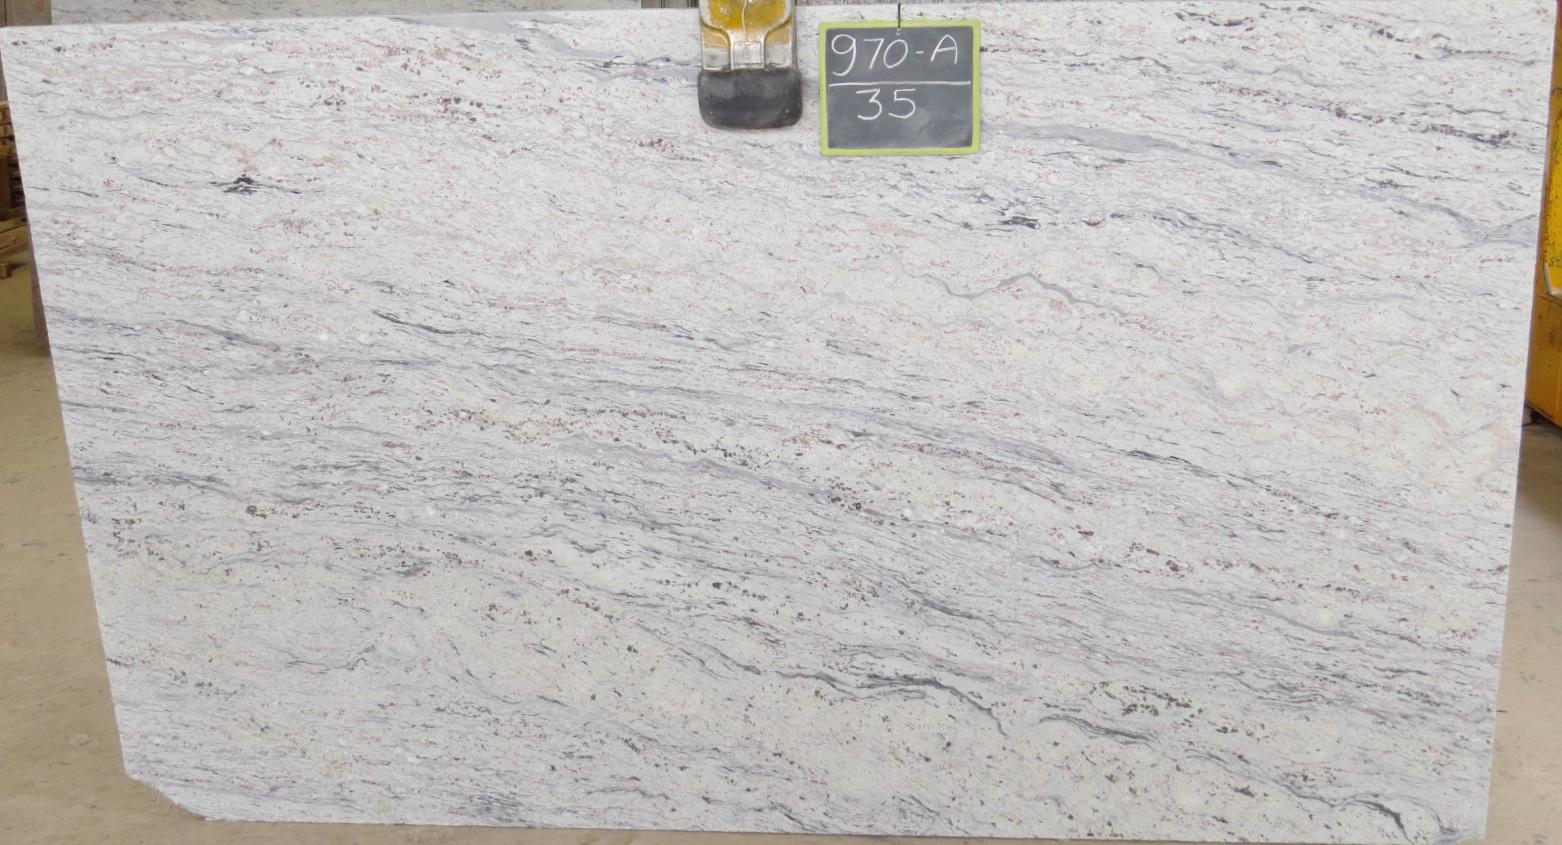 aapt granite bengal black white granite slabs. Black Bedroom Furniture Sets. Home Design Ideas